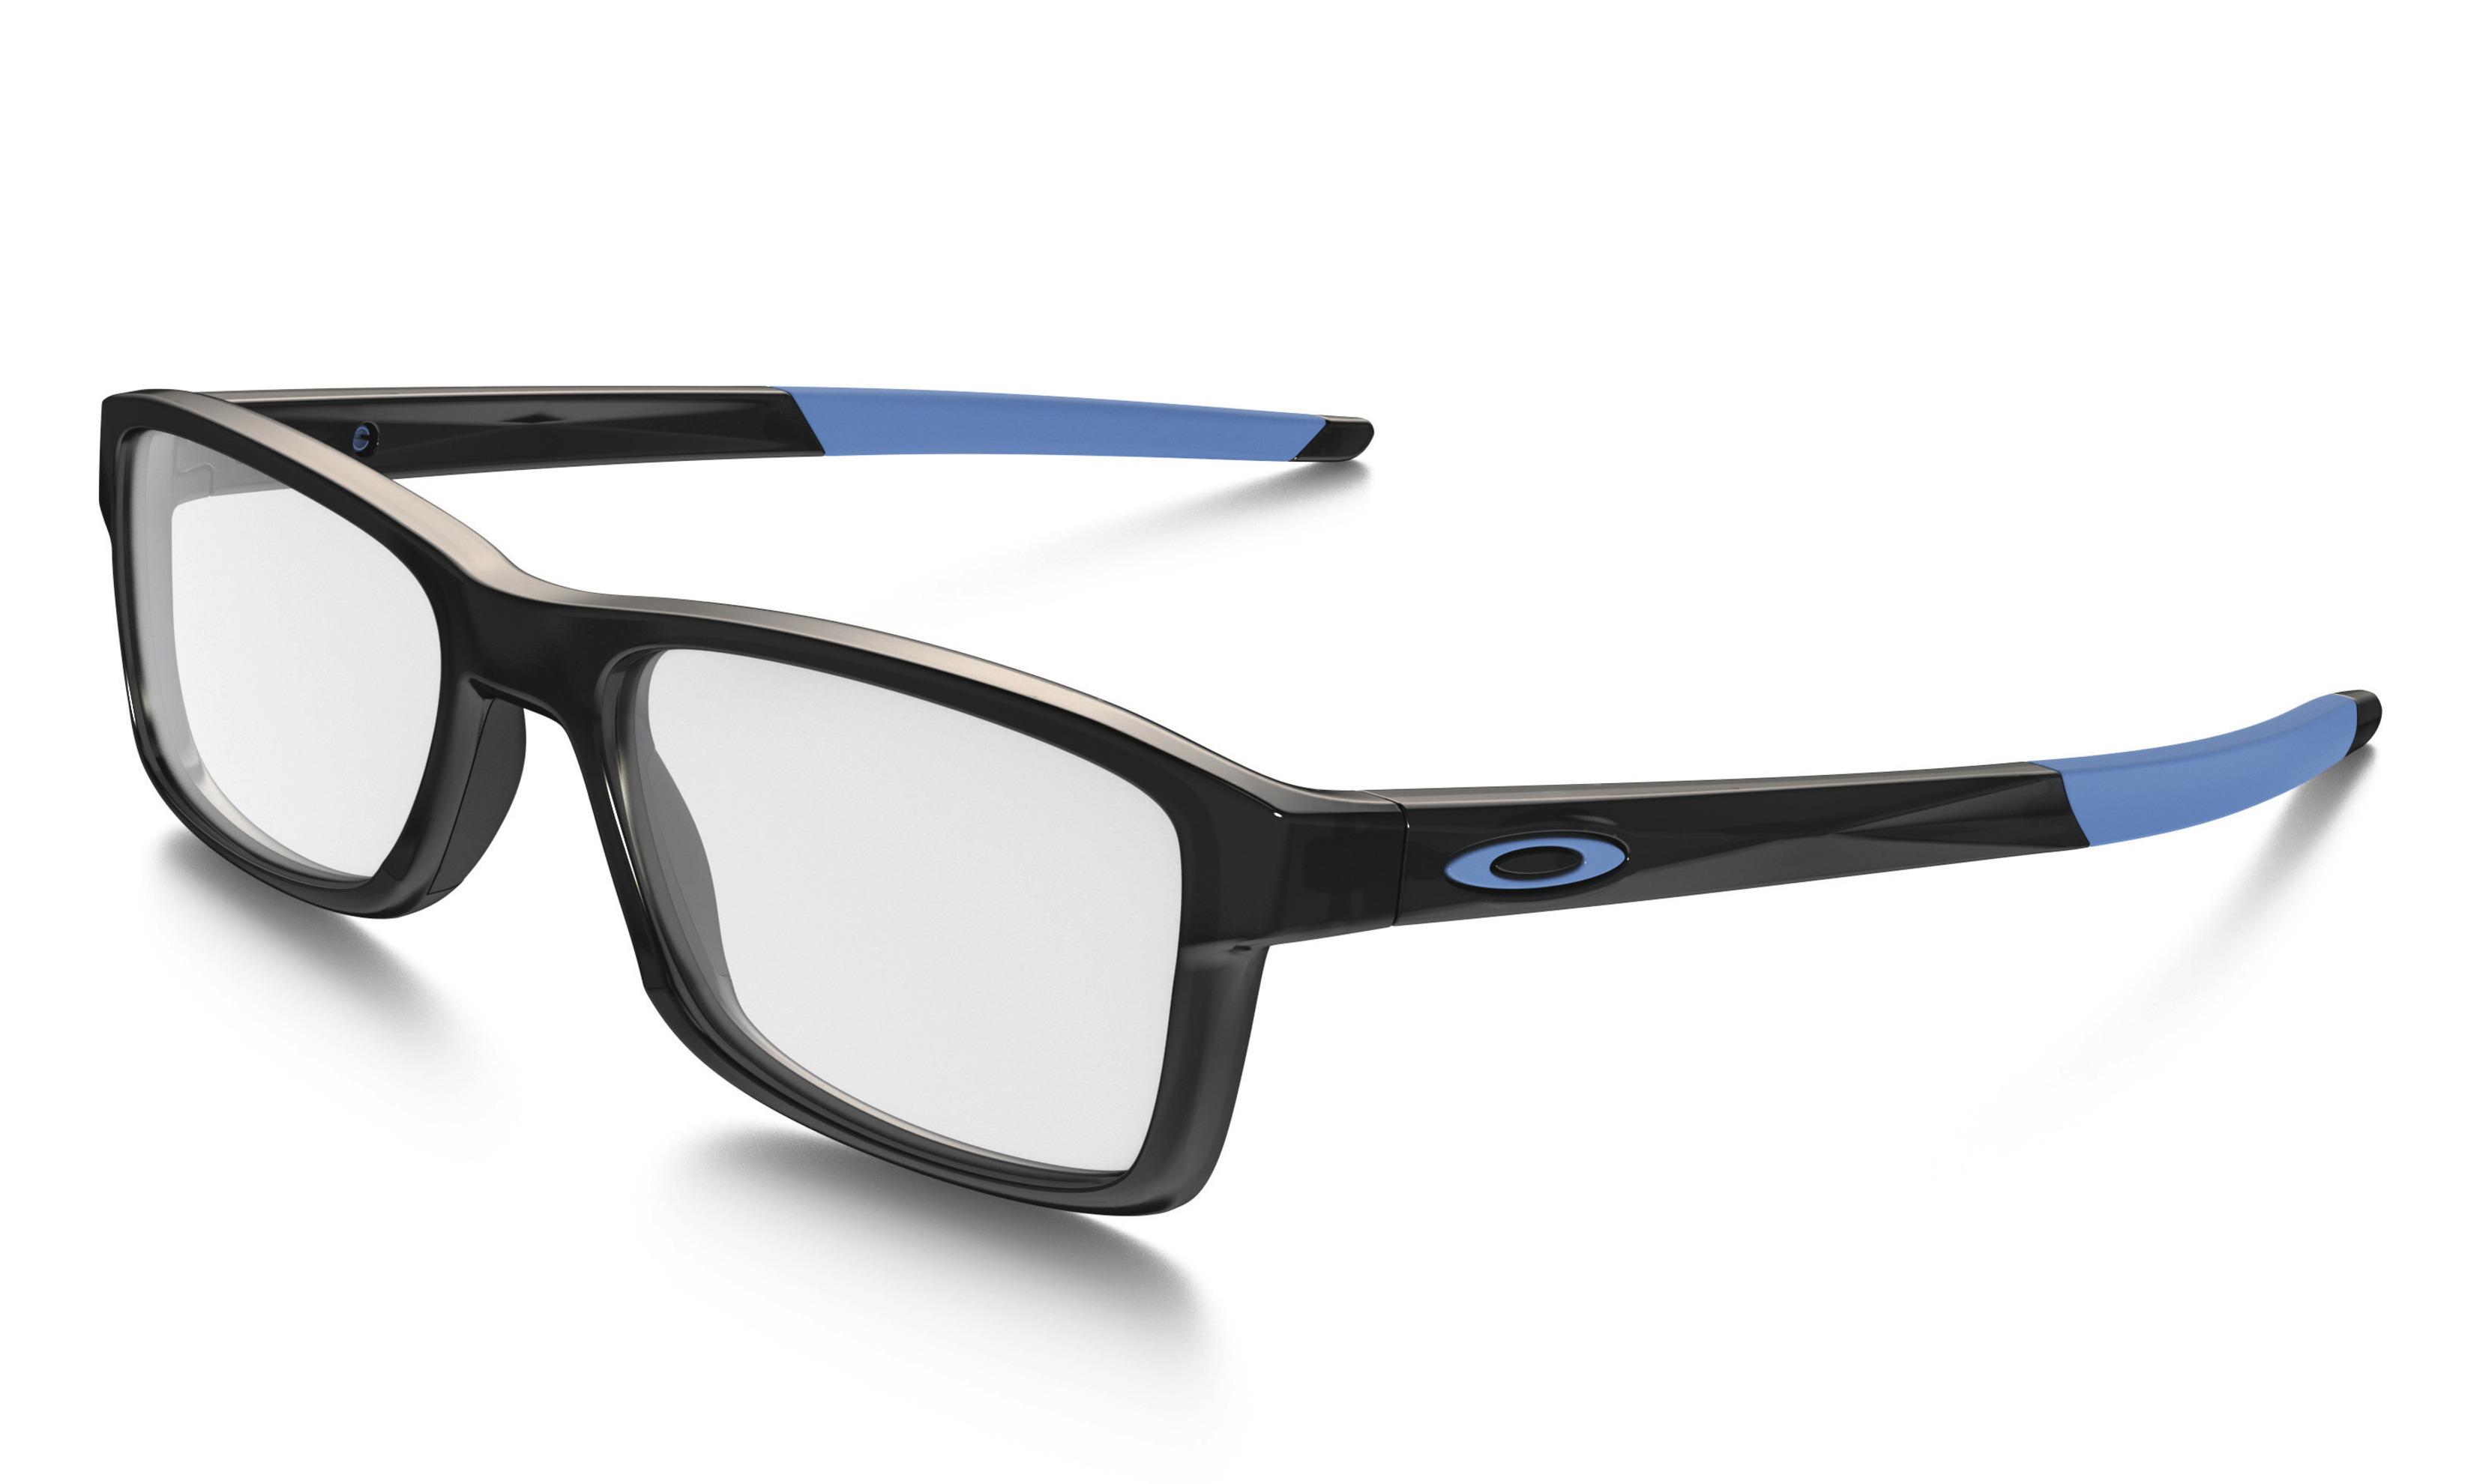 d1646c3bf8 Oakley Crosslink 55 Prescription Glasses